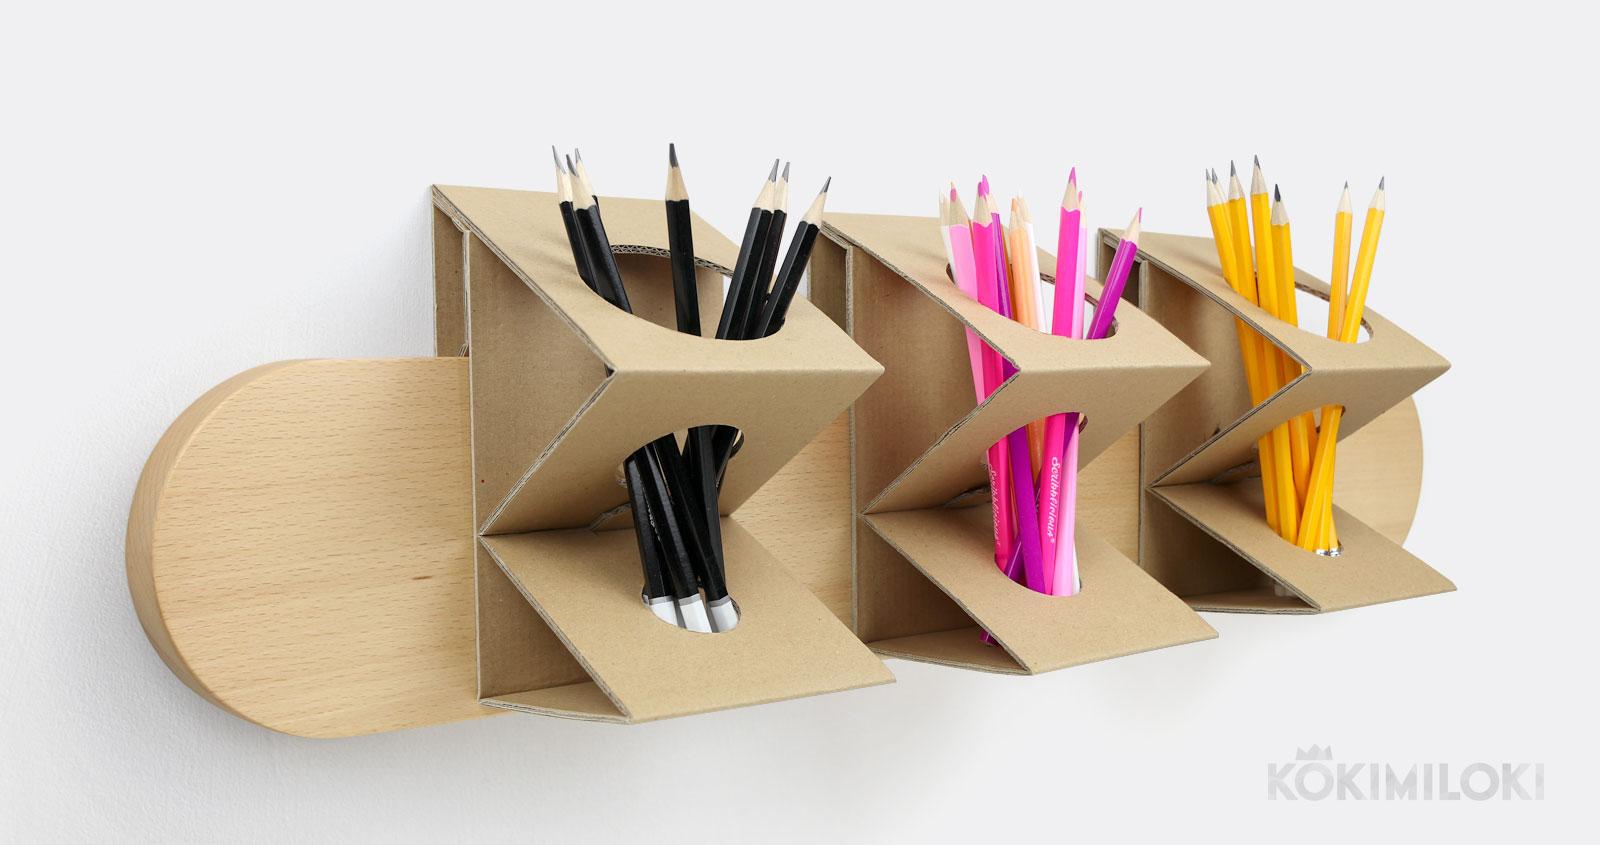 Professional Pencil Holder  Kokimiloki